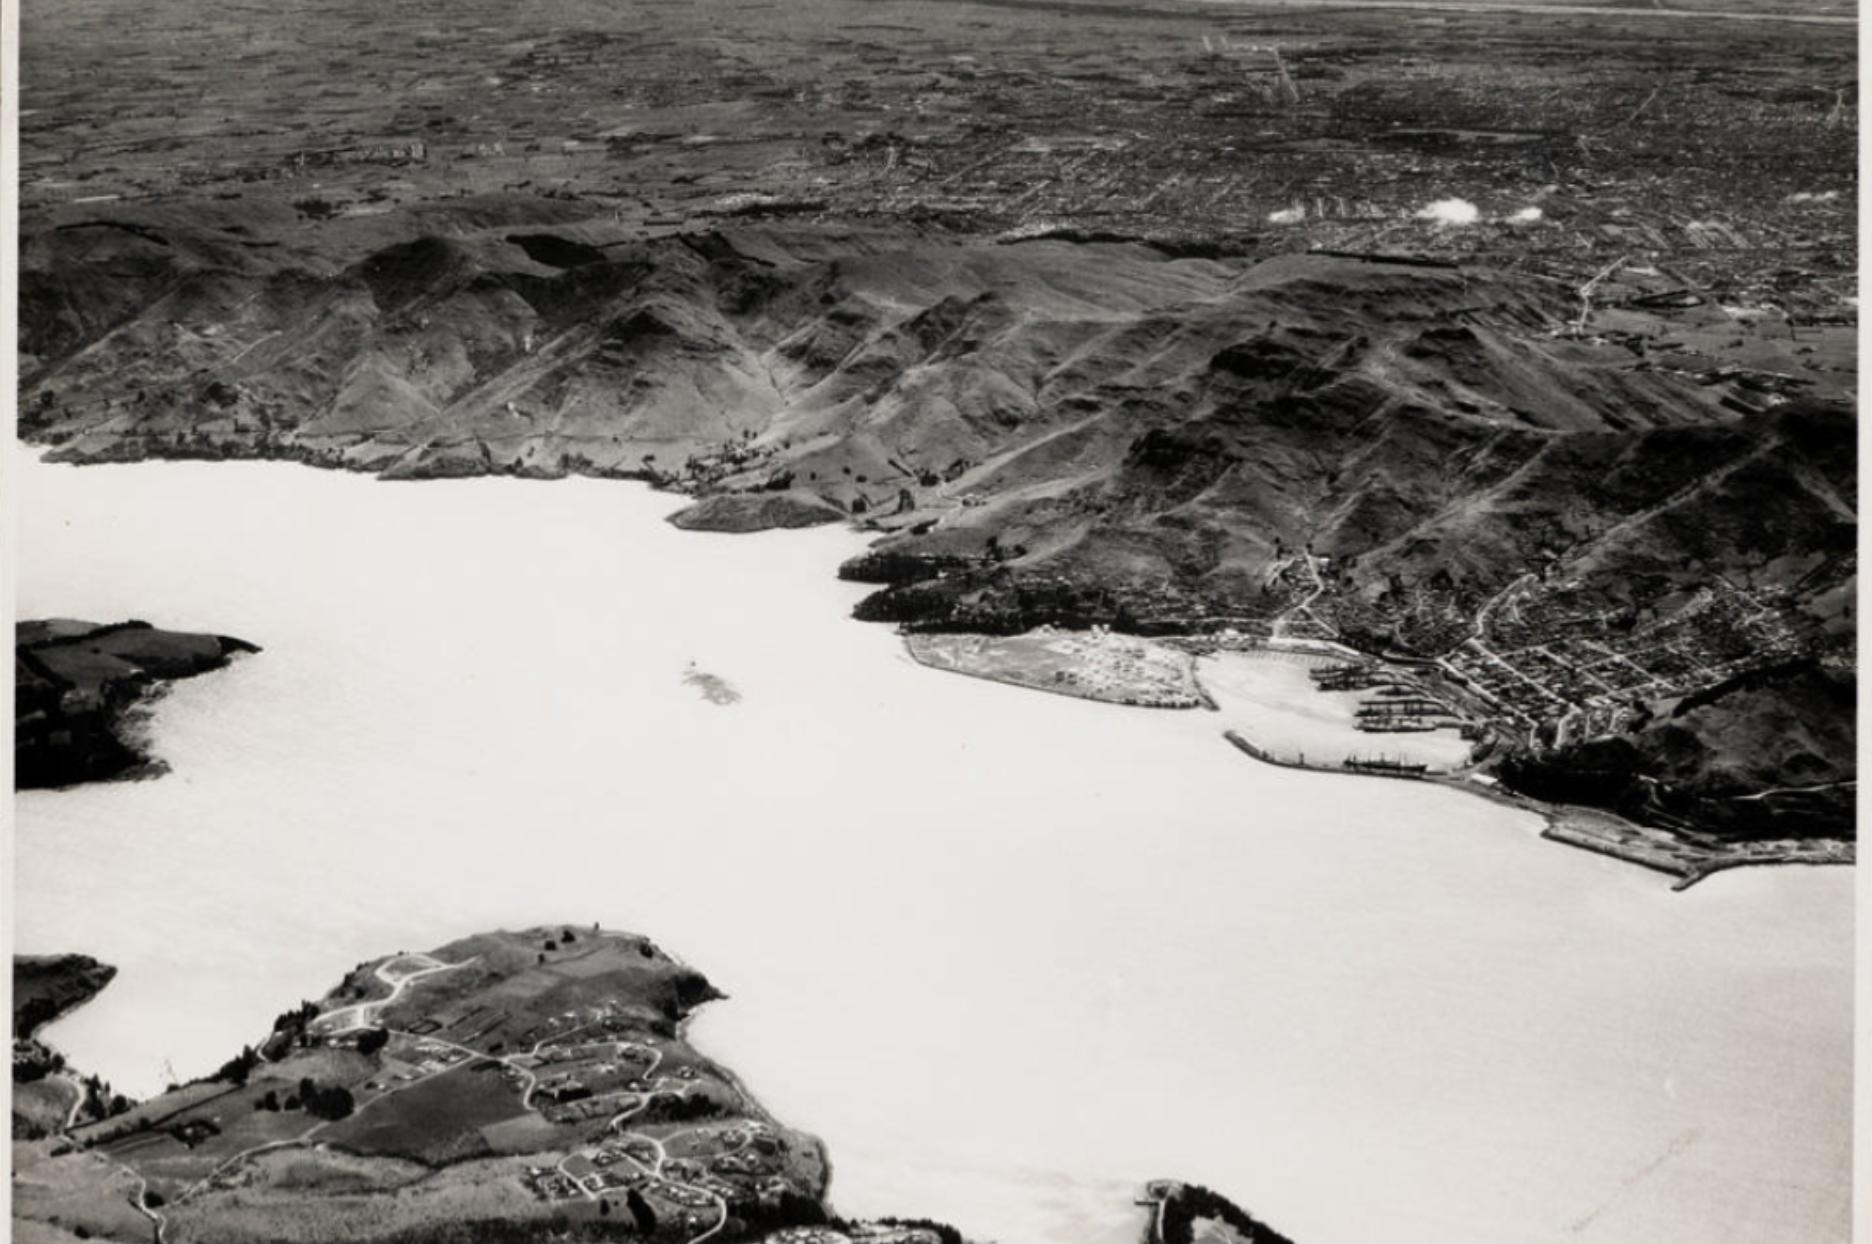 Aerial view of Lyttelton and Whakaraupō, Lyttelton Harbour - 14986.117